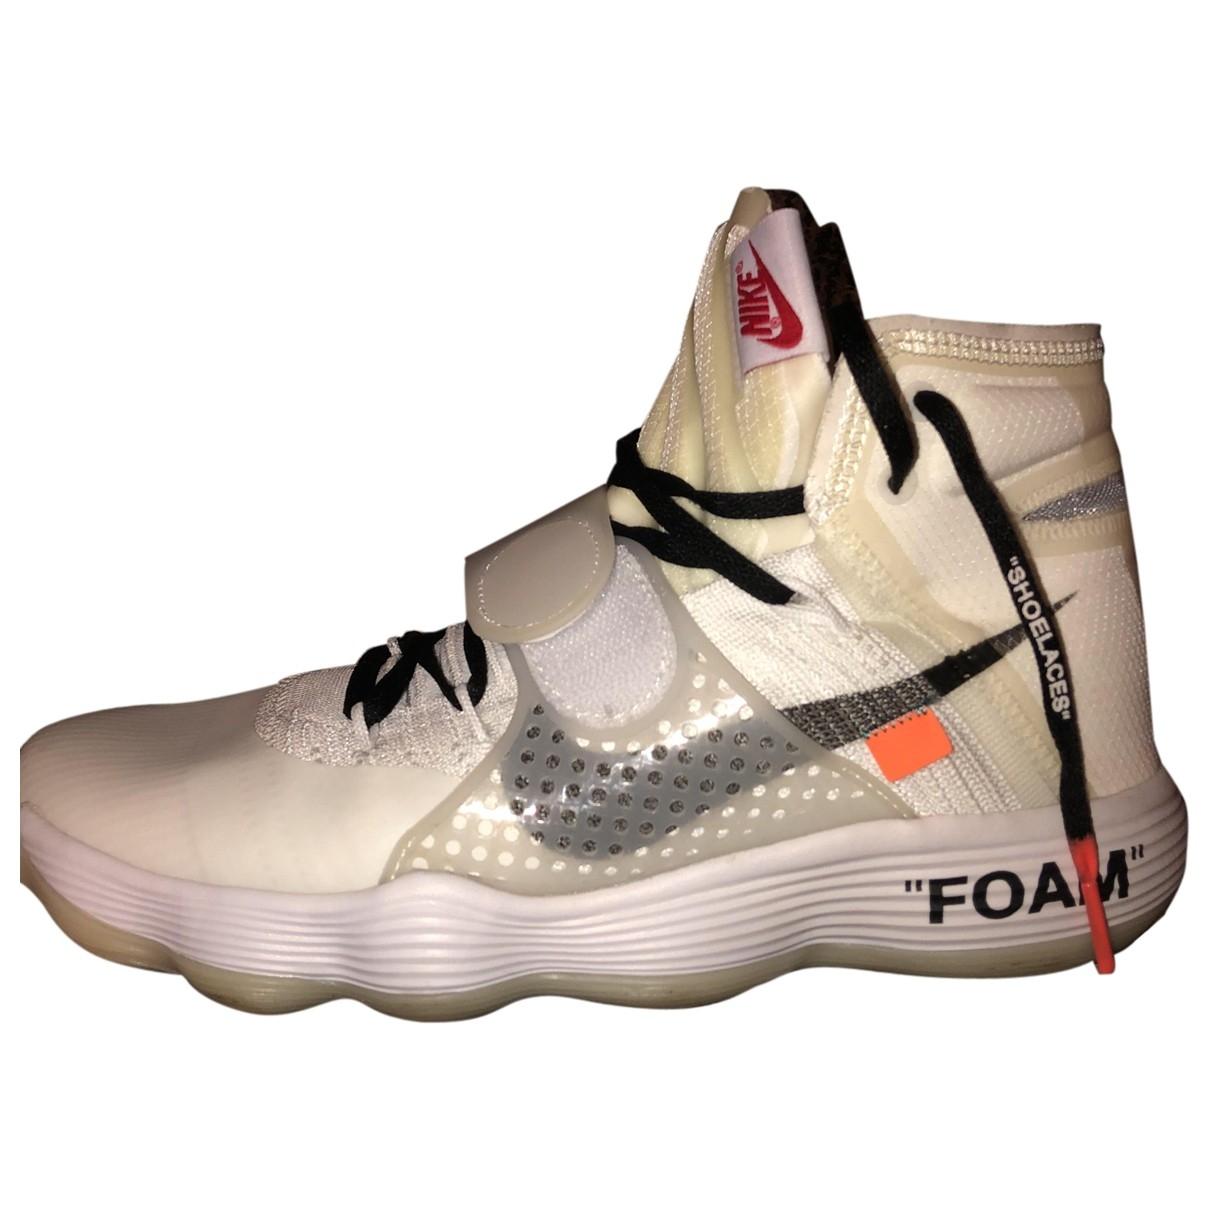 Deportivas React Hyperdunk de Lona Nike X Off-white